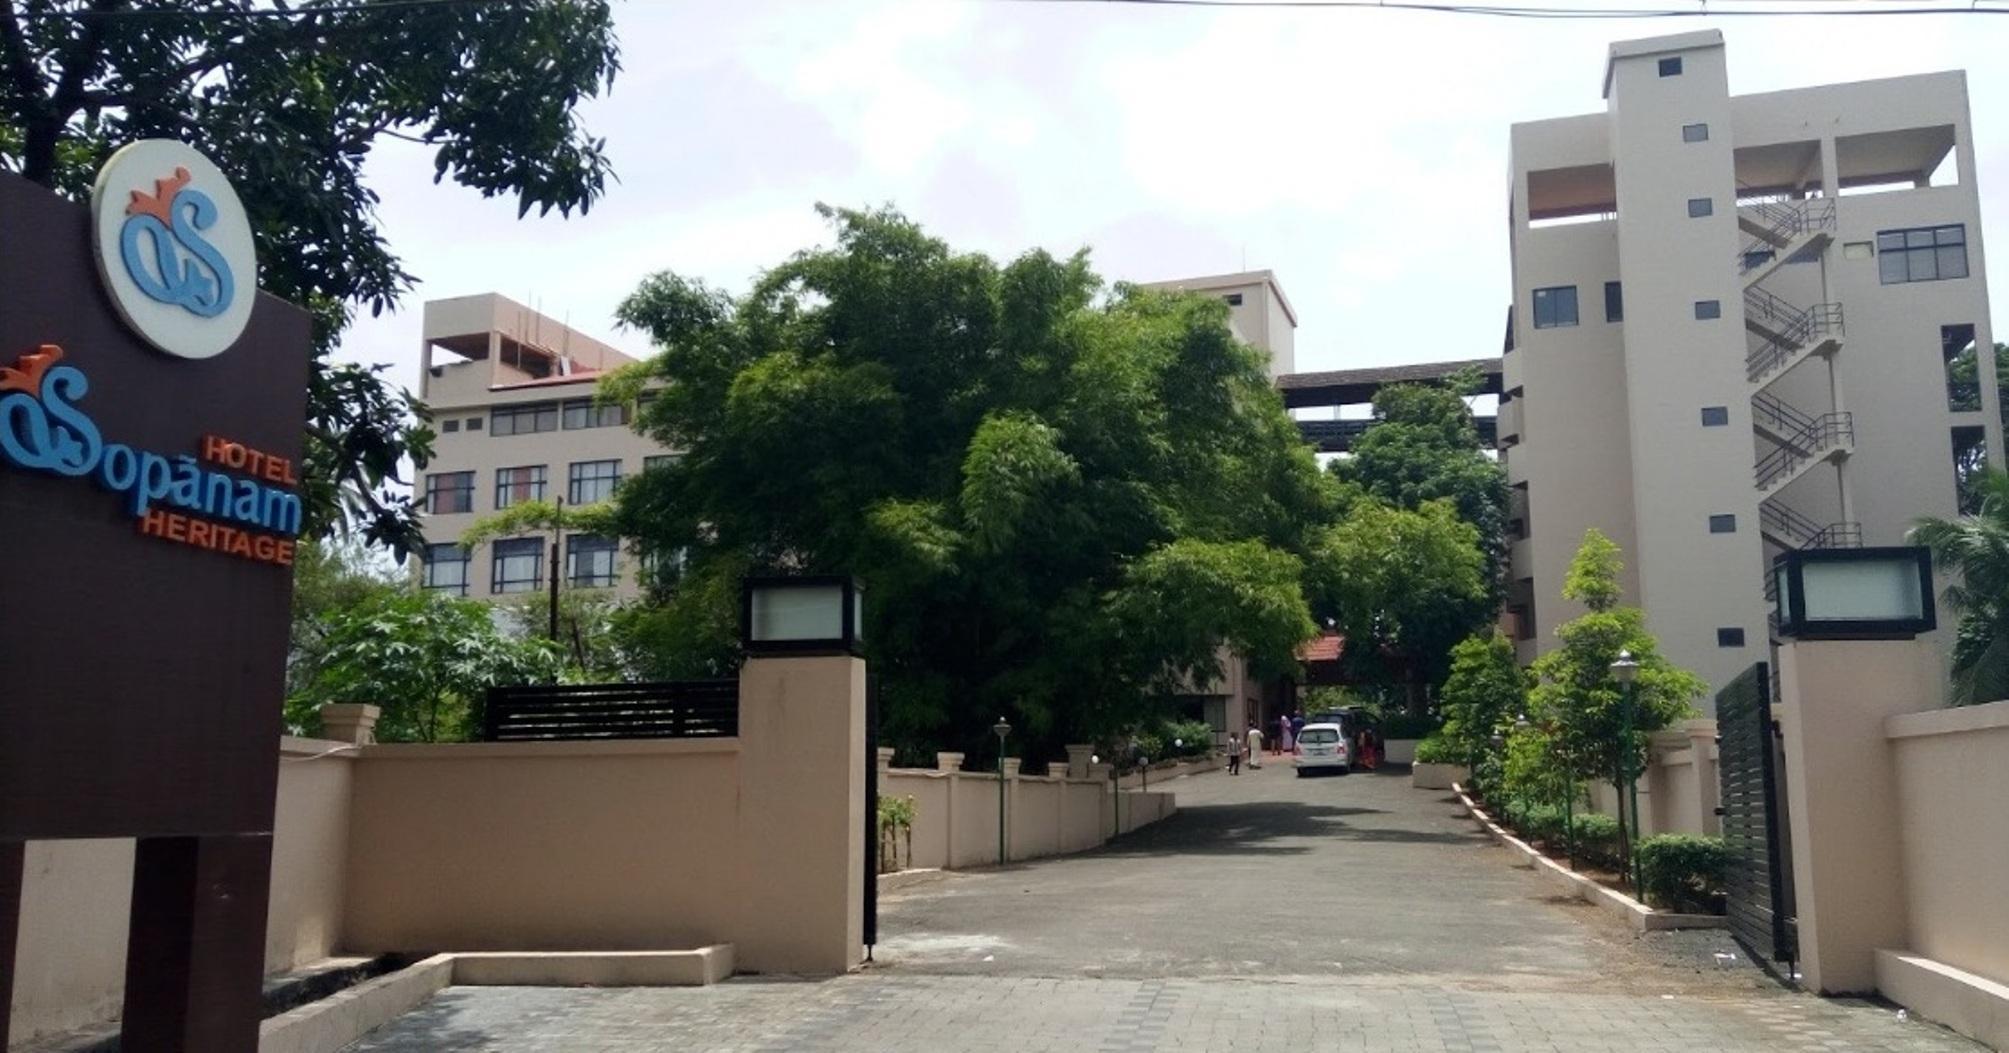 Hotel Sopanam Heritage Guruvayoor India